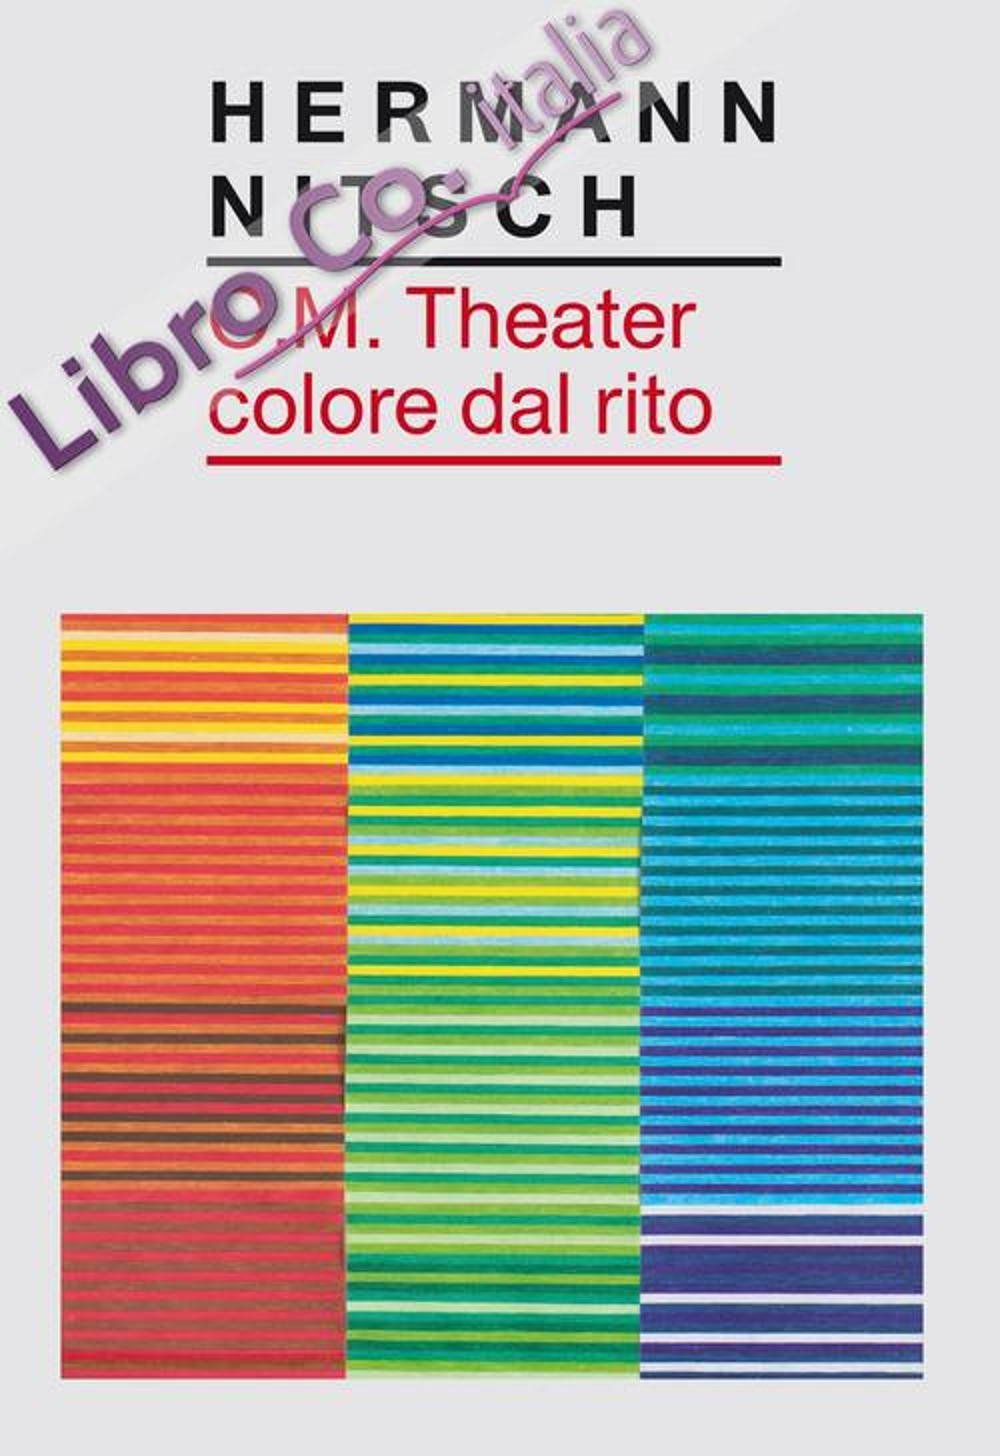 Hermann Nitsch O.M. Theater colore dal rito